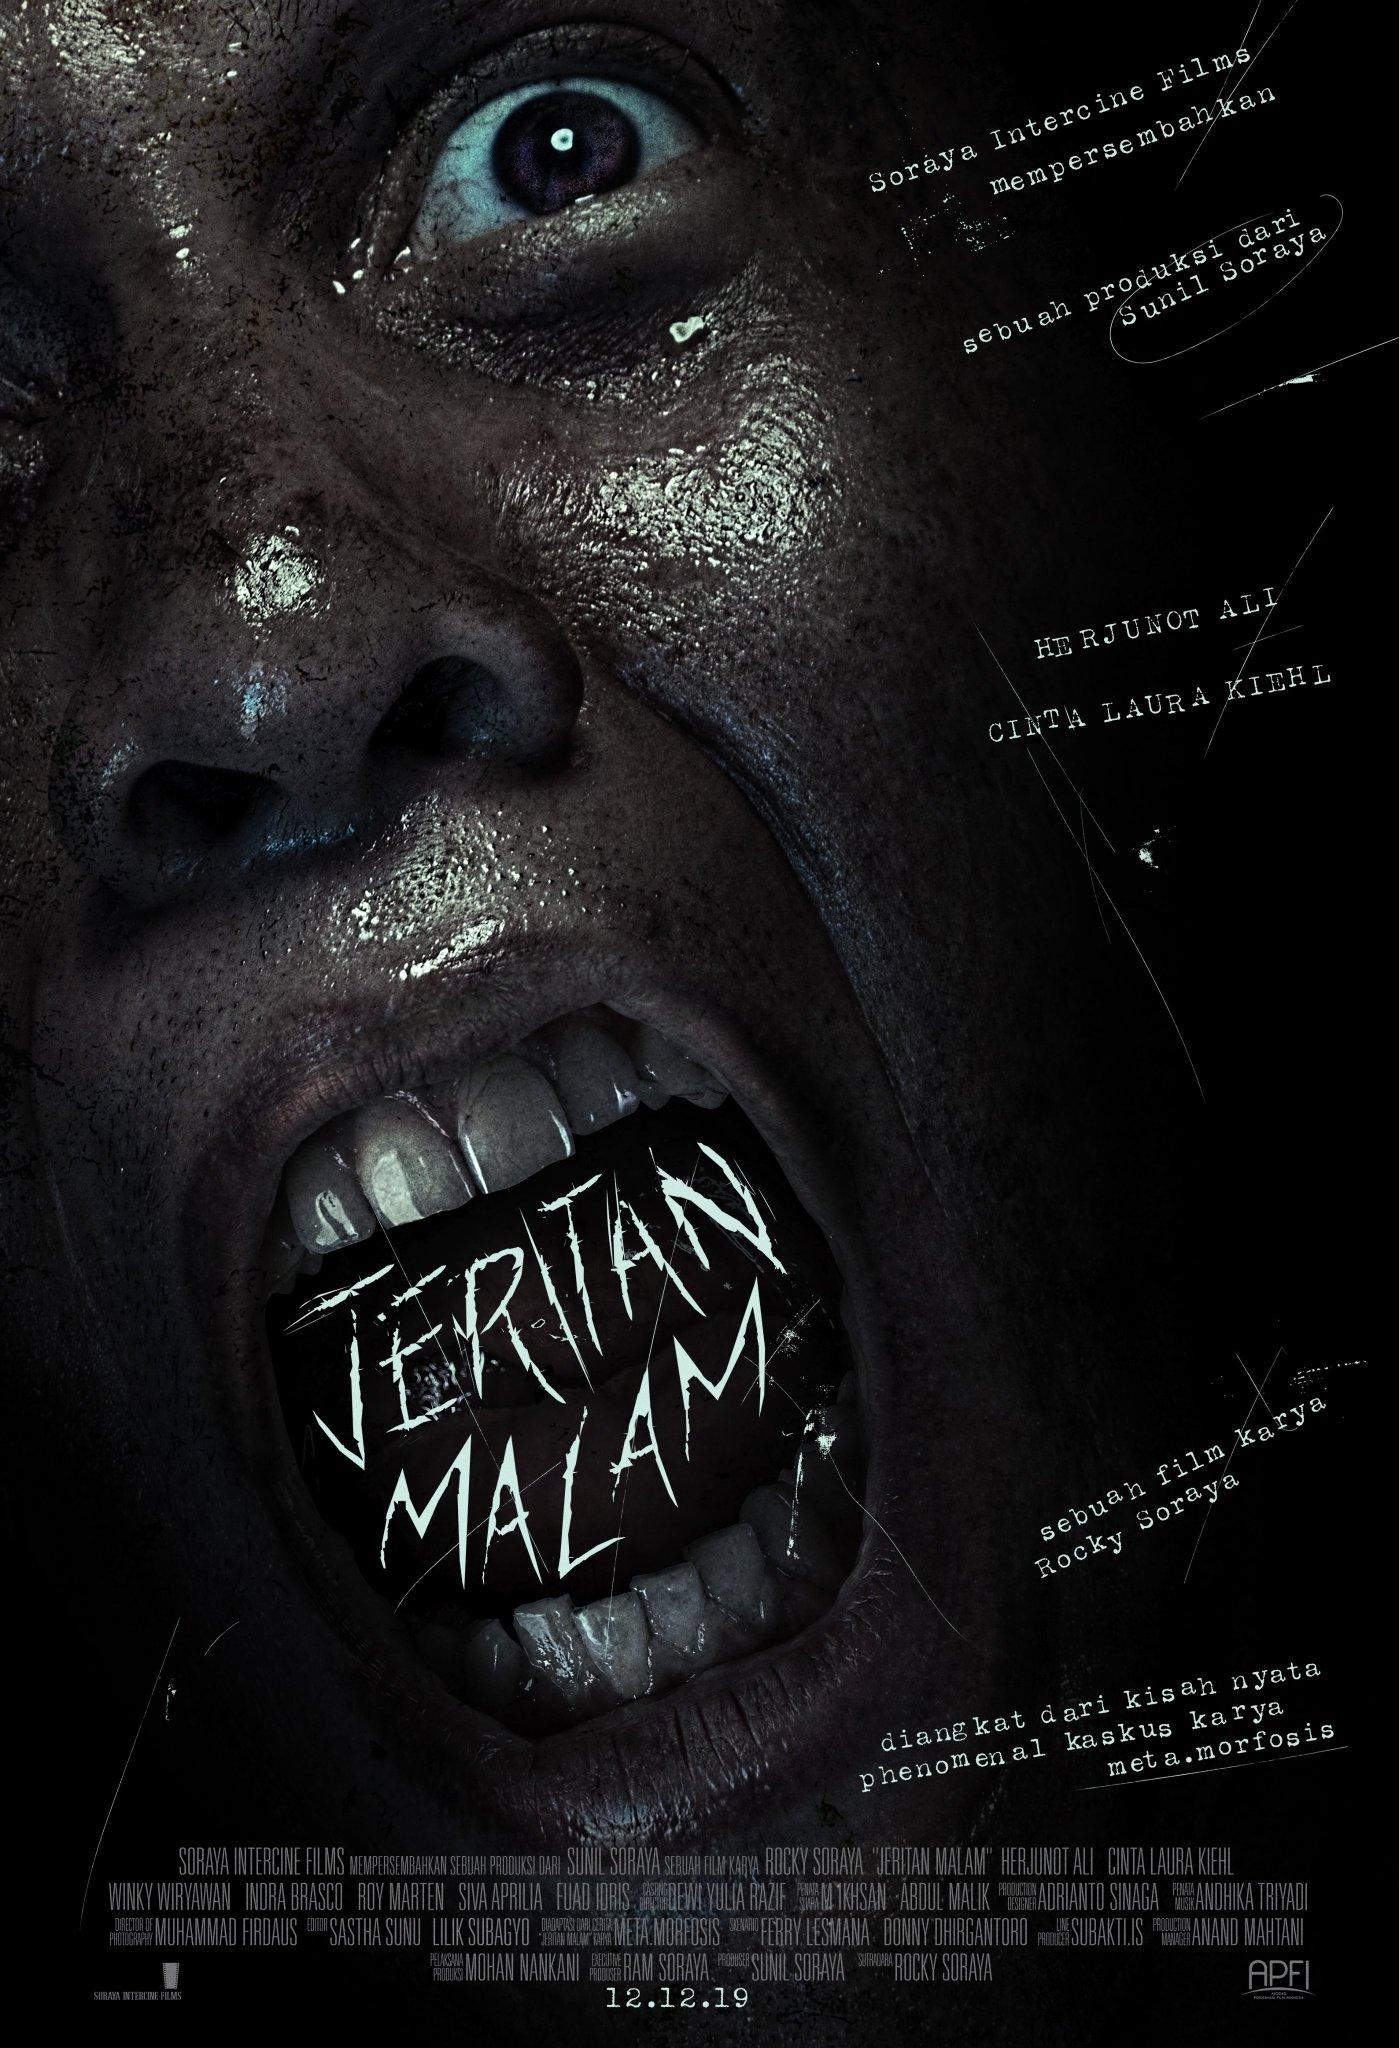 Download Jeritan Malam (2019) Full Movie | Stream Jeritan Malam (2019) Full HD | Watch Jeritan Malam (2019) | Free Download Jeritan Malam (2019) Full Movie